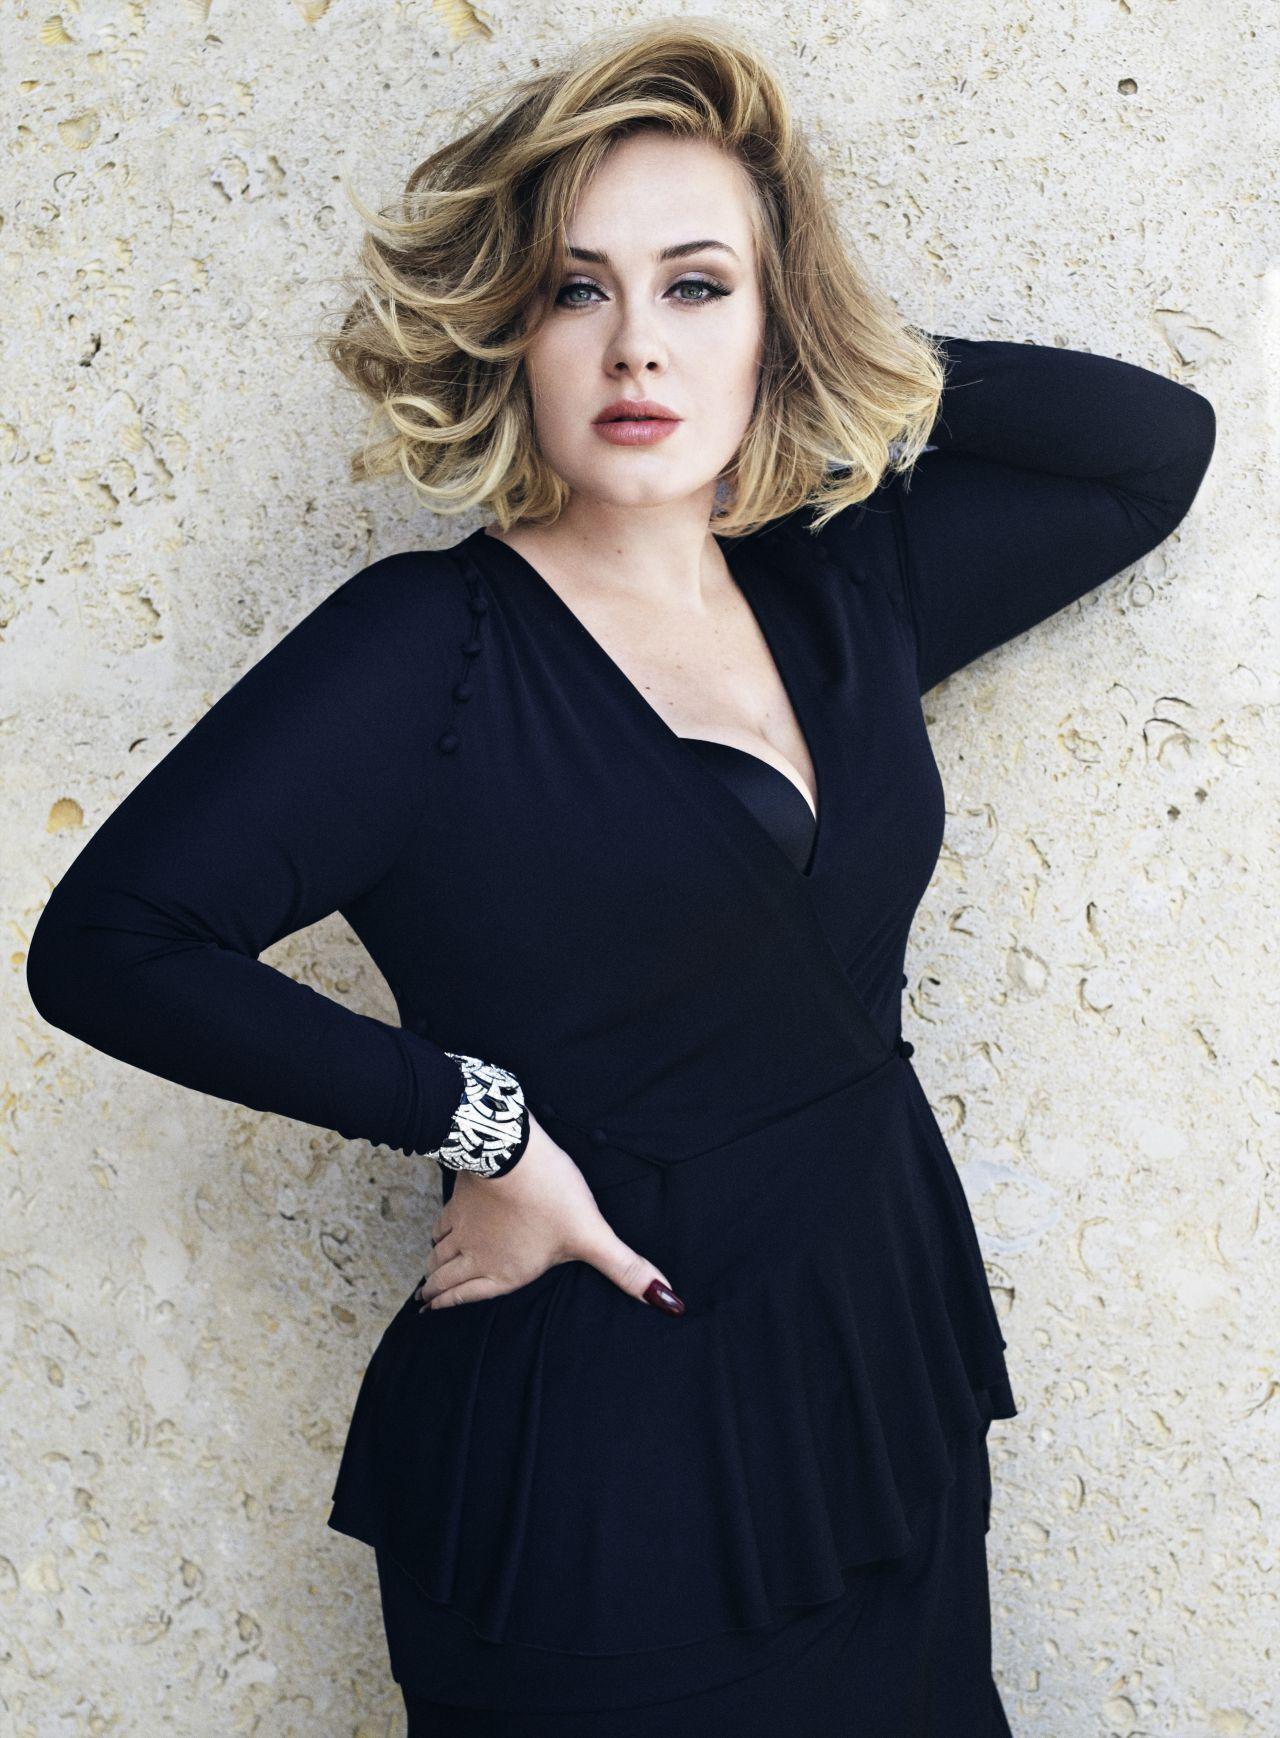 Adele sexy side pics